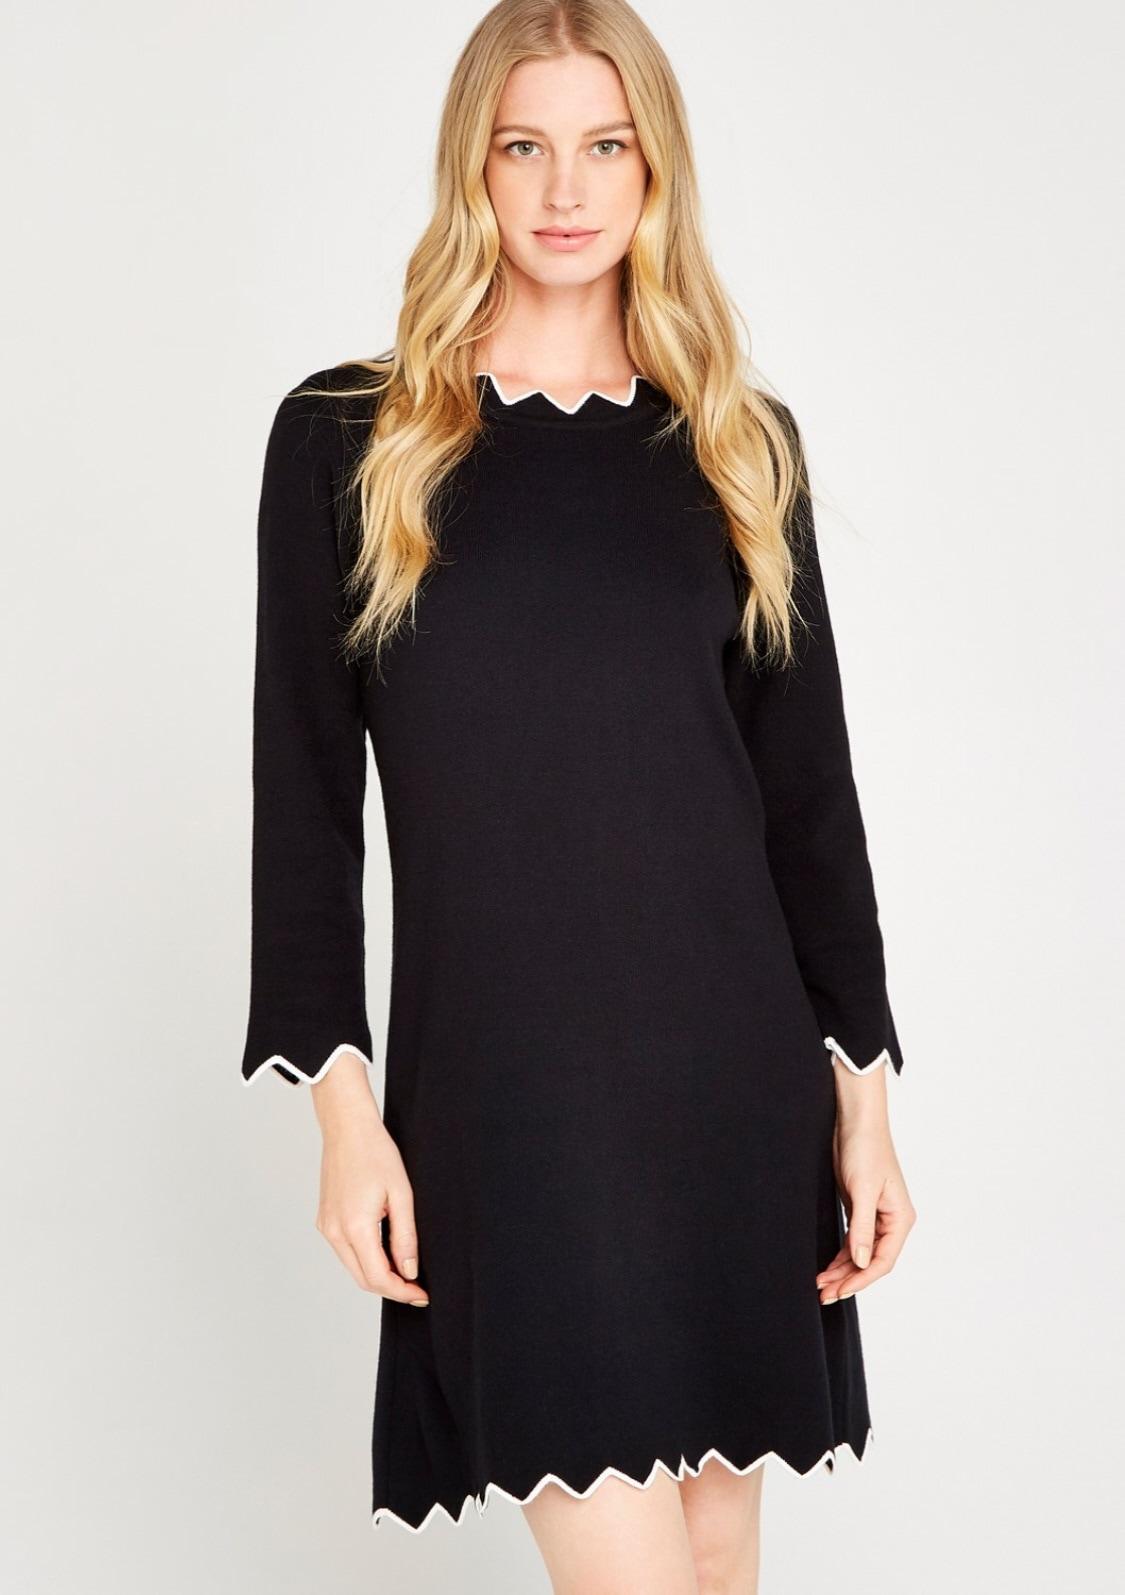 Image of Apricot Strickkleid »Zigzag Bodycon 3/4 Sleeve Dress«